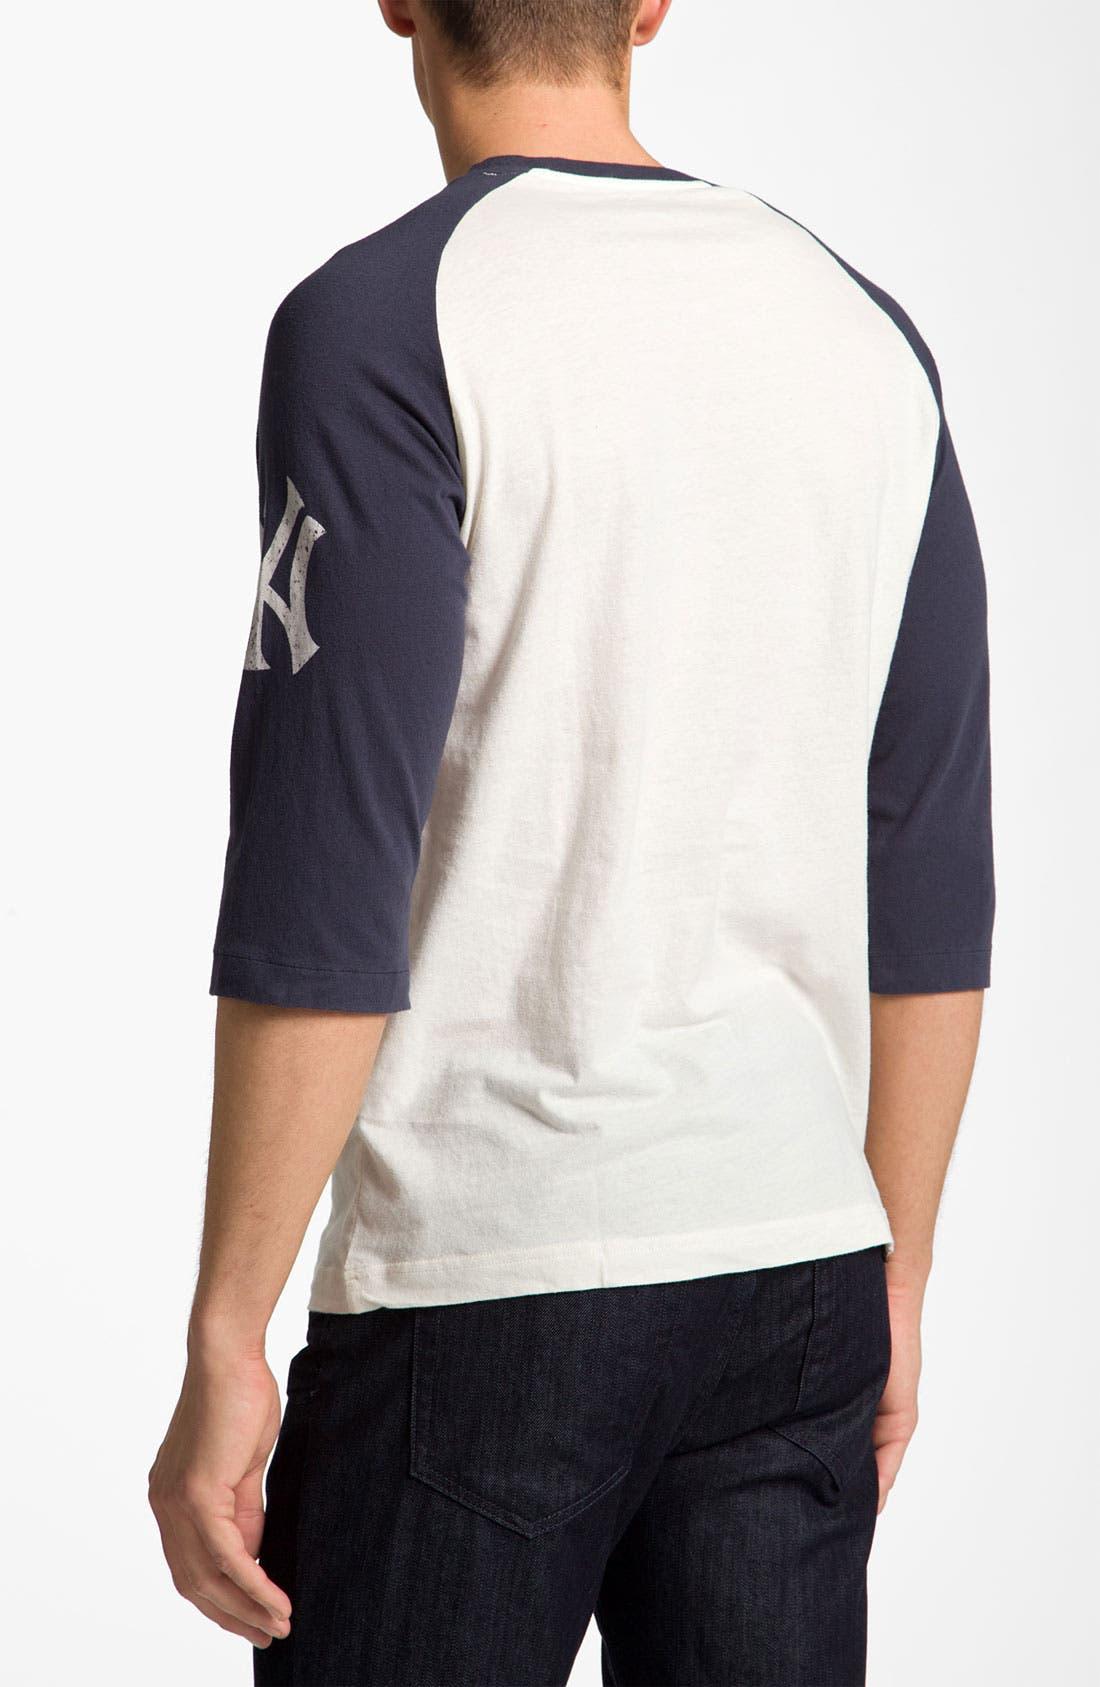 'New York Yankees' Baseball T-Shirt,                             Alternate thumbnail 2, color,                             280